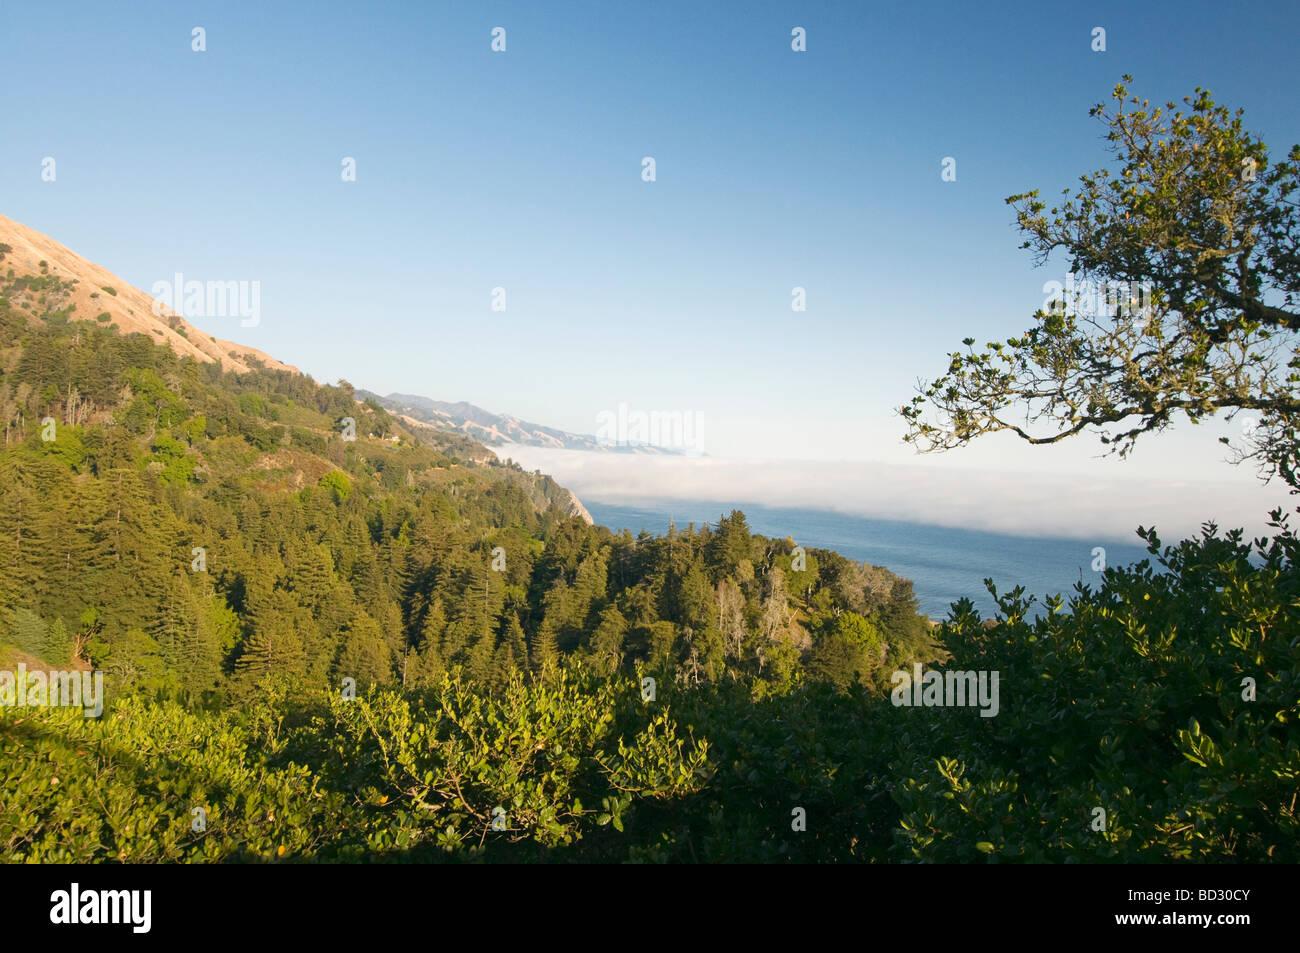 Big Sur California coast with fog - Stock Image